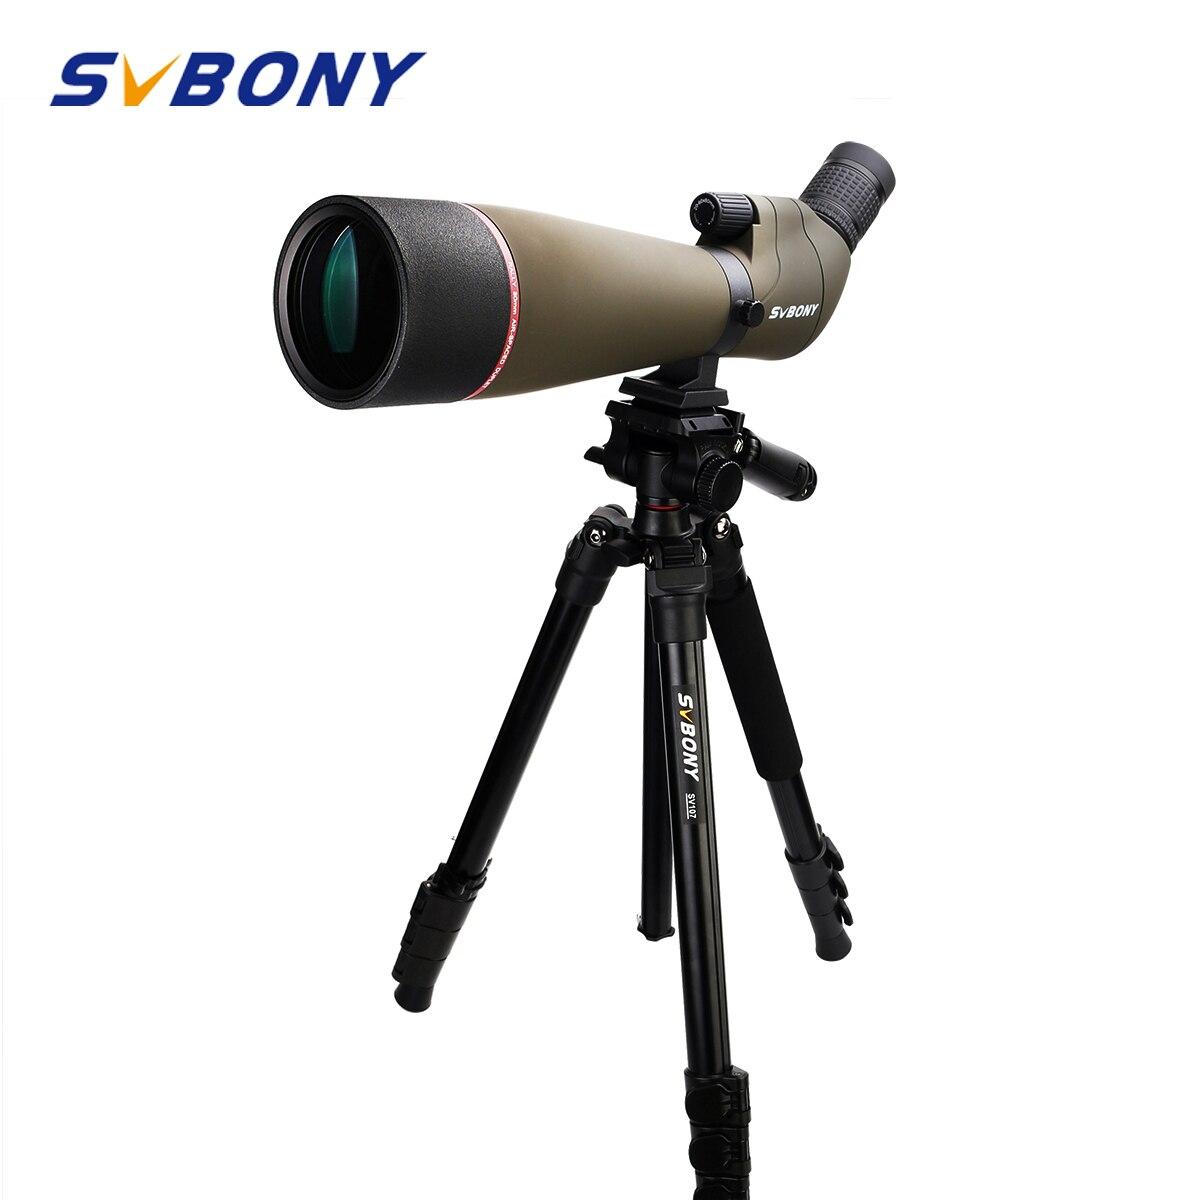 Svbony 80mm Spotting Scope Multi-Coated Optics 20-60x Zoom Refractor 45-Degree Viewing Angle w/ 3KG Max Loading Capacity Tripod